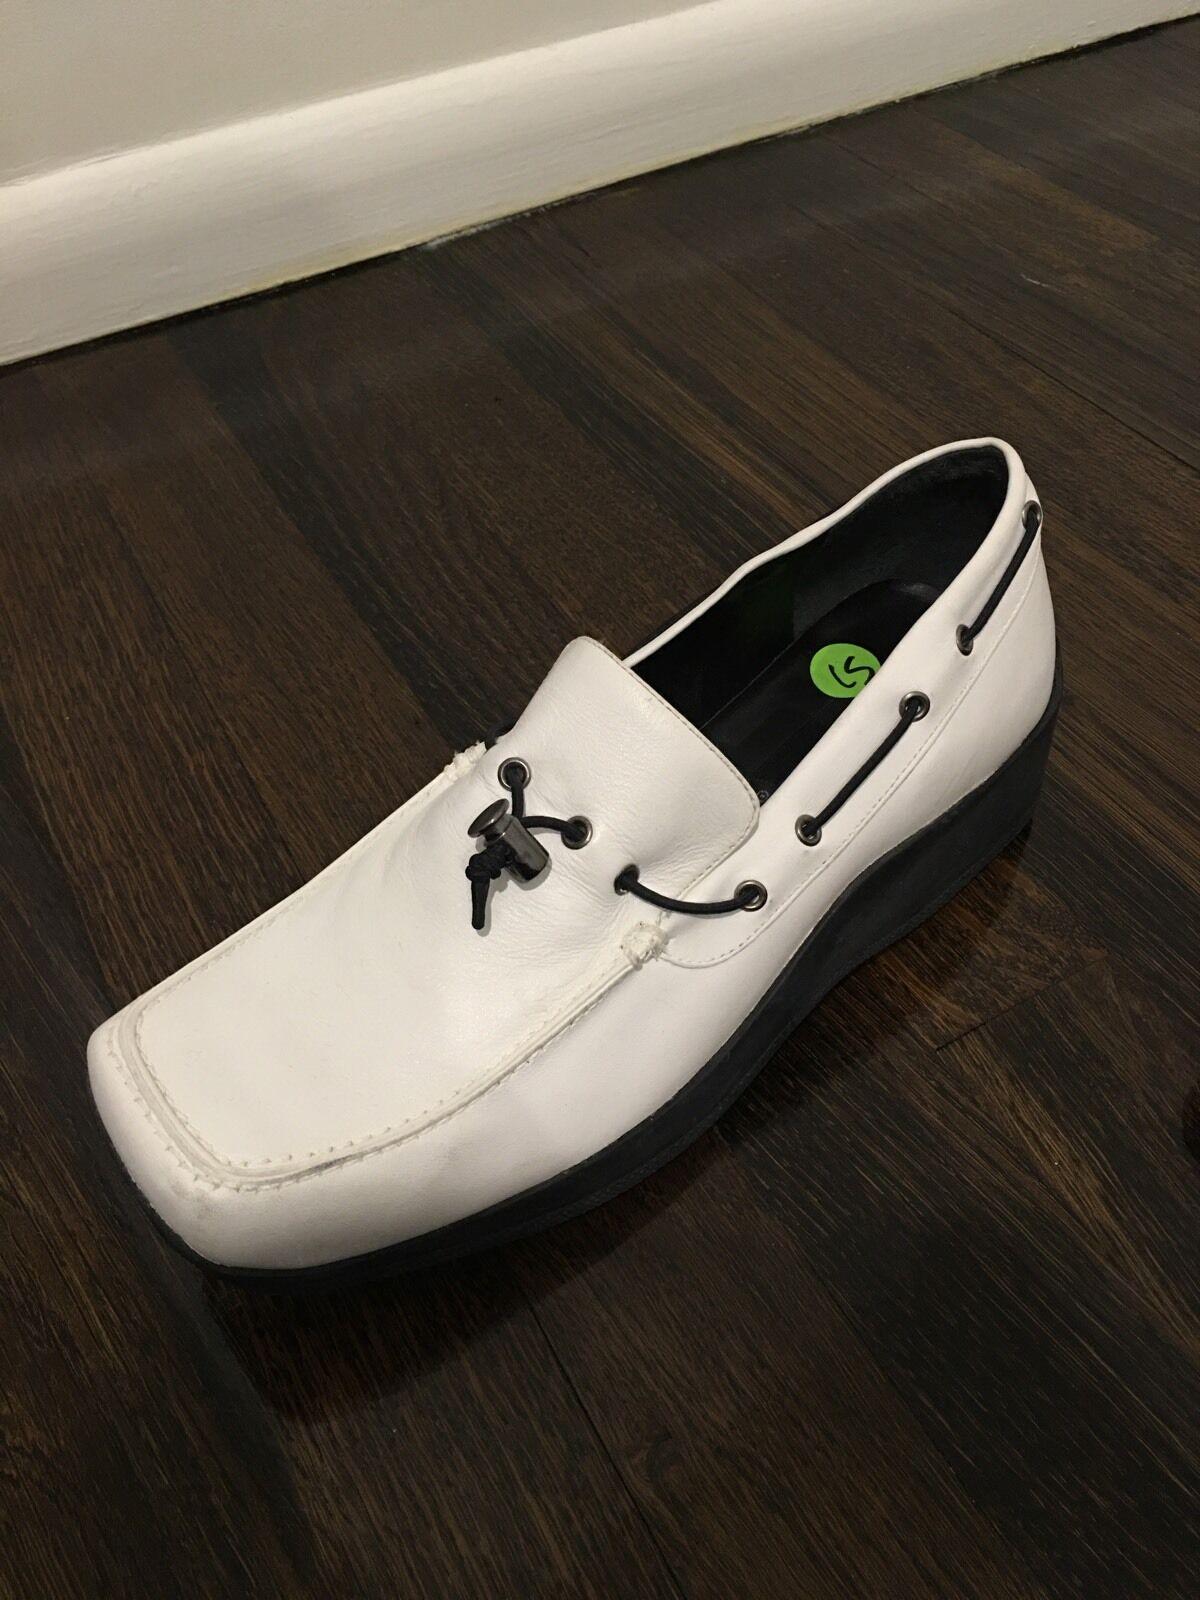 New Scarpe David Aaron bianca New Loafer Taglia 9 Pelle Scarpe New bianca 131b67 ... 722e36